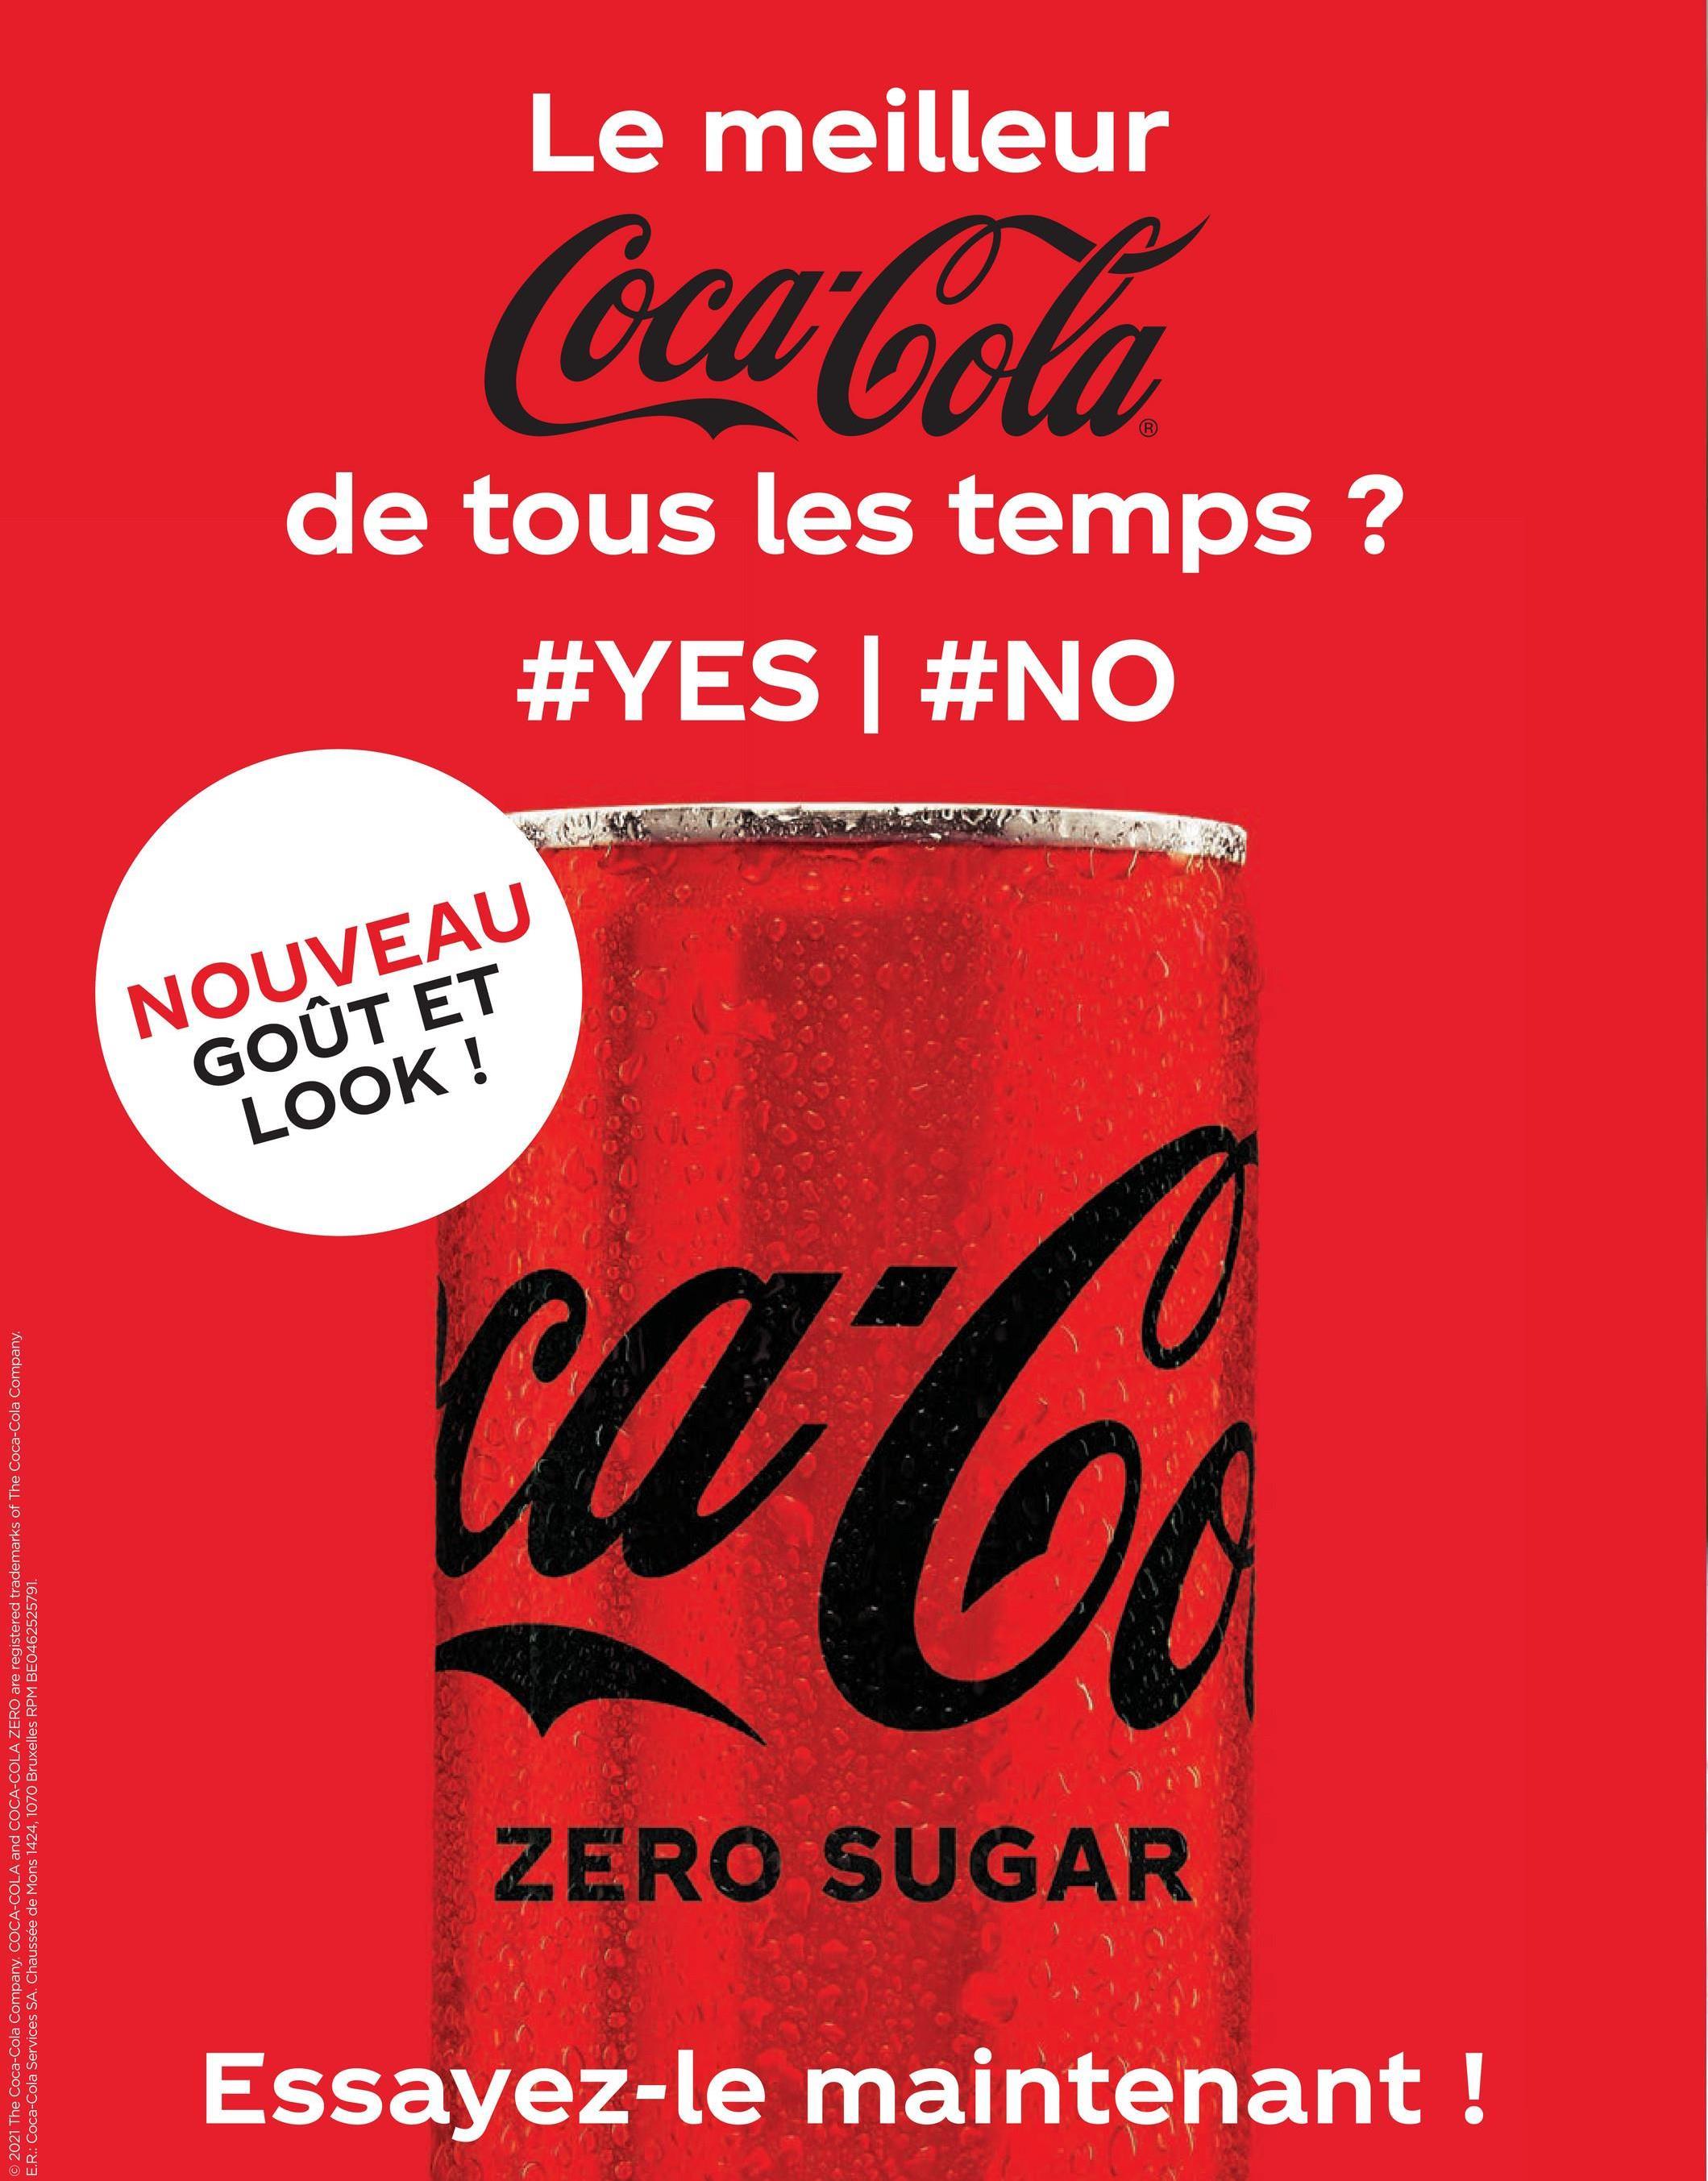 © 2021 The Coca-Cola Company. COCA-COLA and COCA-COLA ZERO are registered trademarks of The Coca-Cola Company E.R.: Coca-Cola Services SA. Chaussée de Mons 1424, 1070 Bruxelles RPM BE0462525791. LOOK! GOUT ET NOUVEAU Essayez-le maintenant ! ZERO SUGAR wala #YES #NO de tous les temps ? Coca Cola Le meilleur